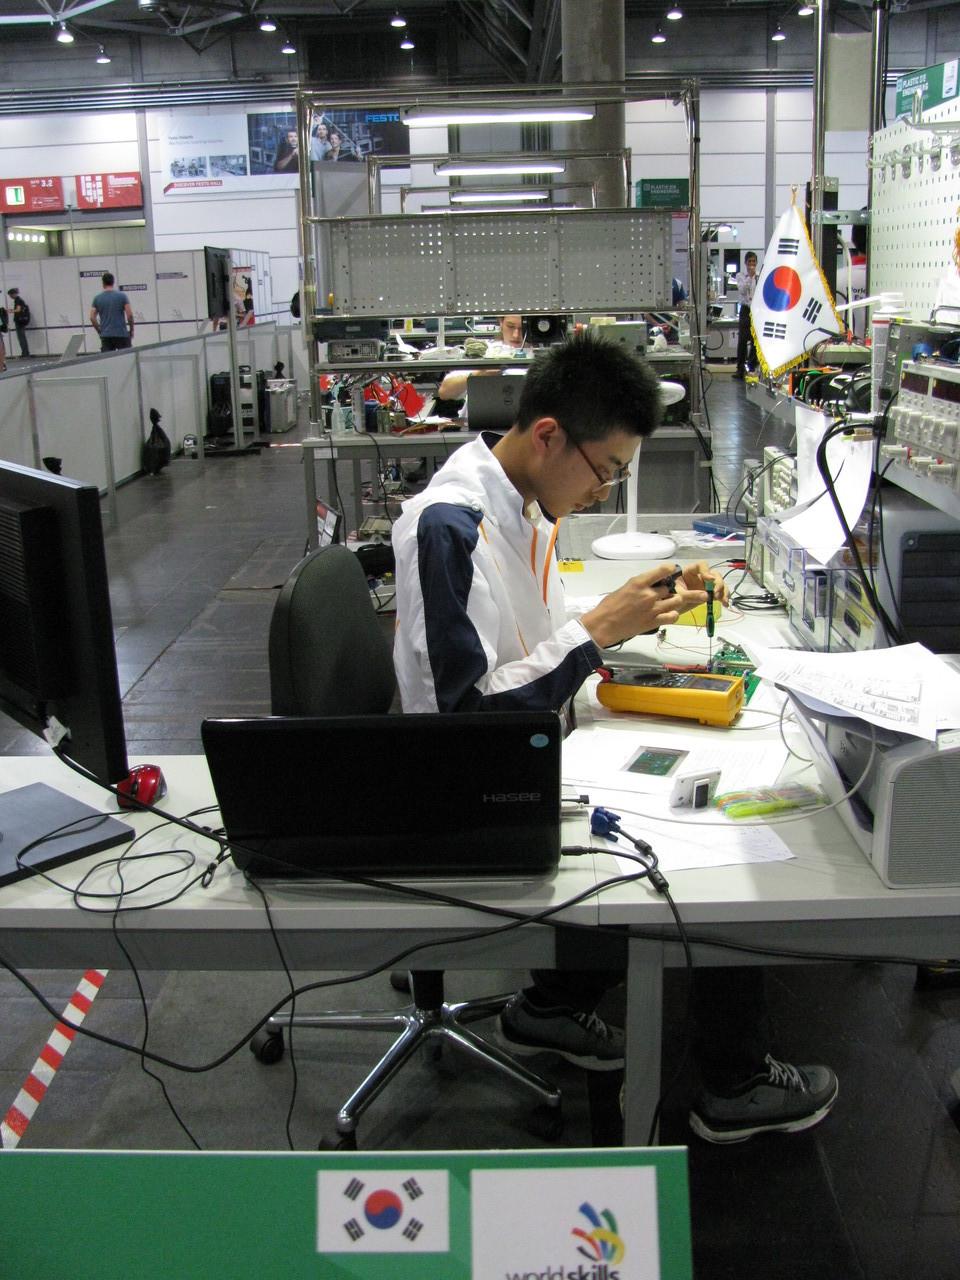 Ebenso gaben ihr Bestes: Myeong- Jin Kim aus der Republik Korea als Elektroniker